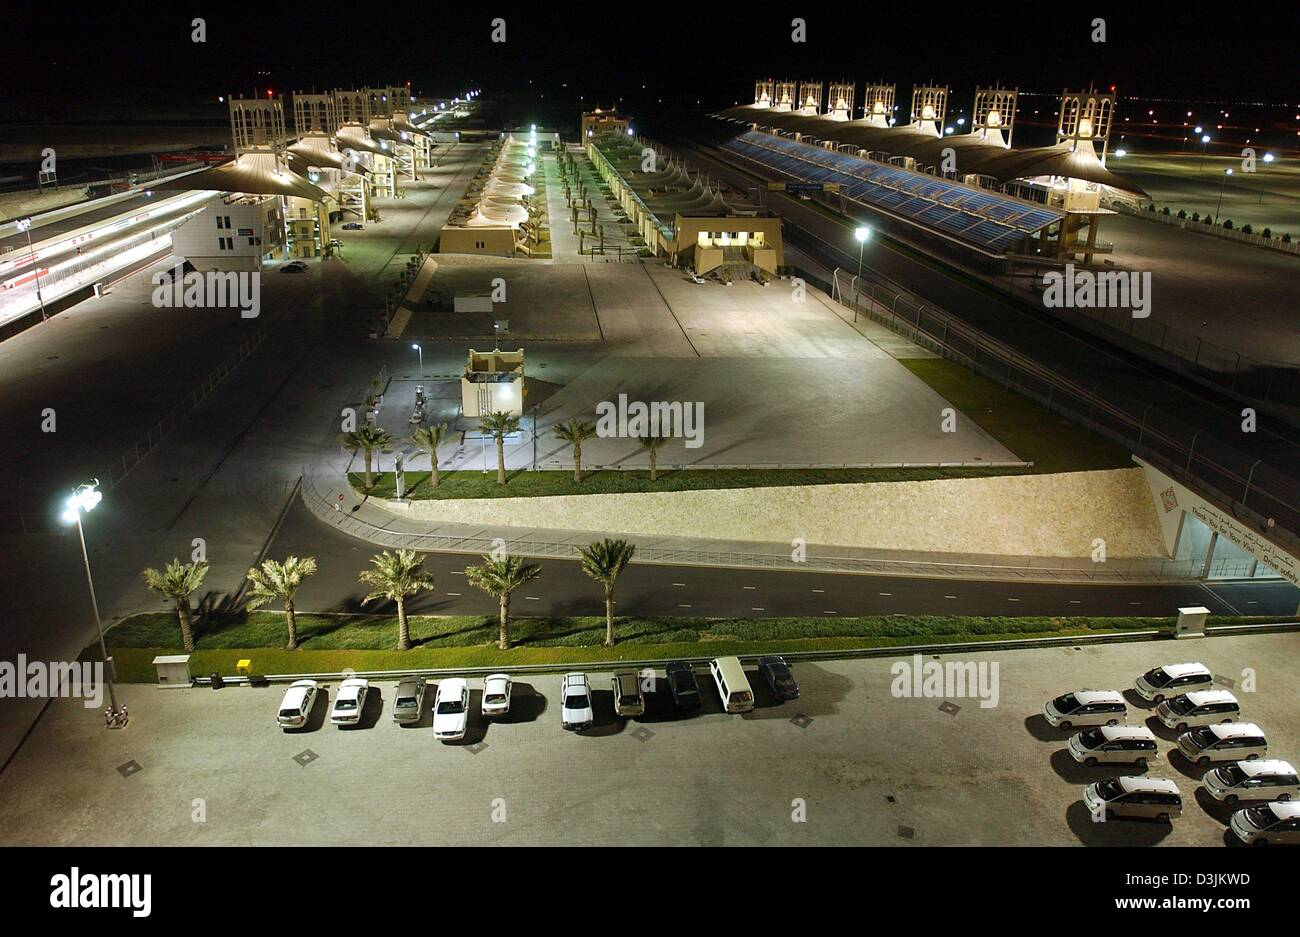 (dpa) - View of the illuminated Formula 1 race track near Manama, Bahrain, 14 February 2005. - Stock Image